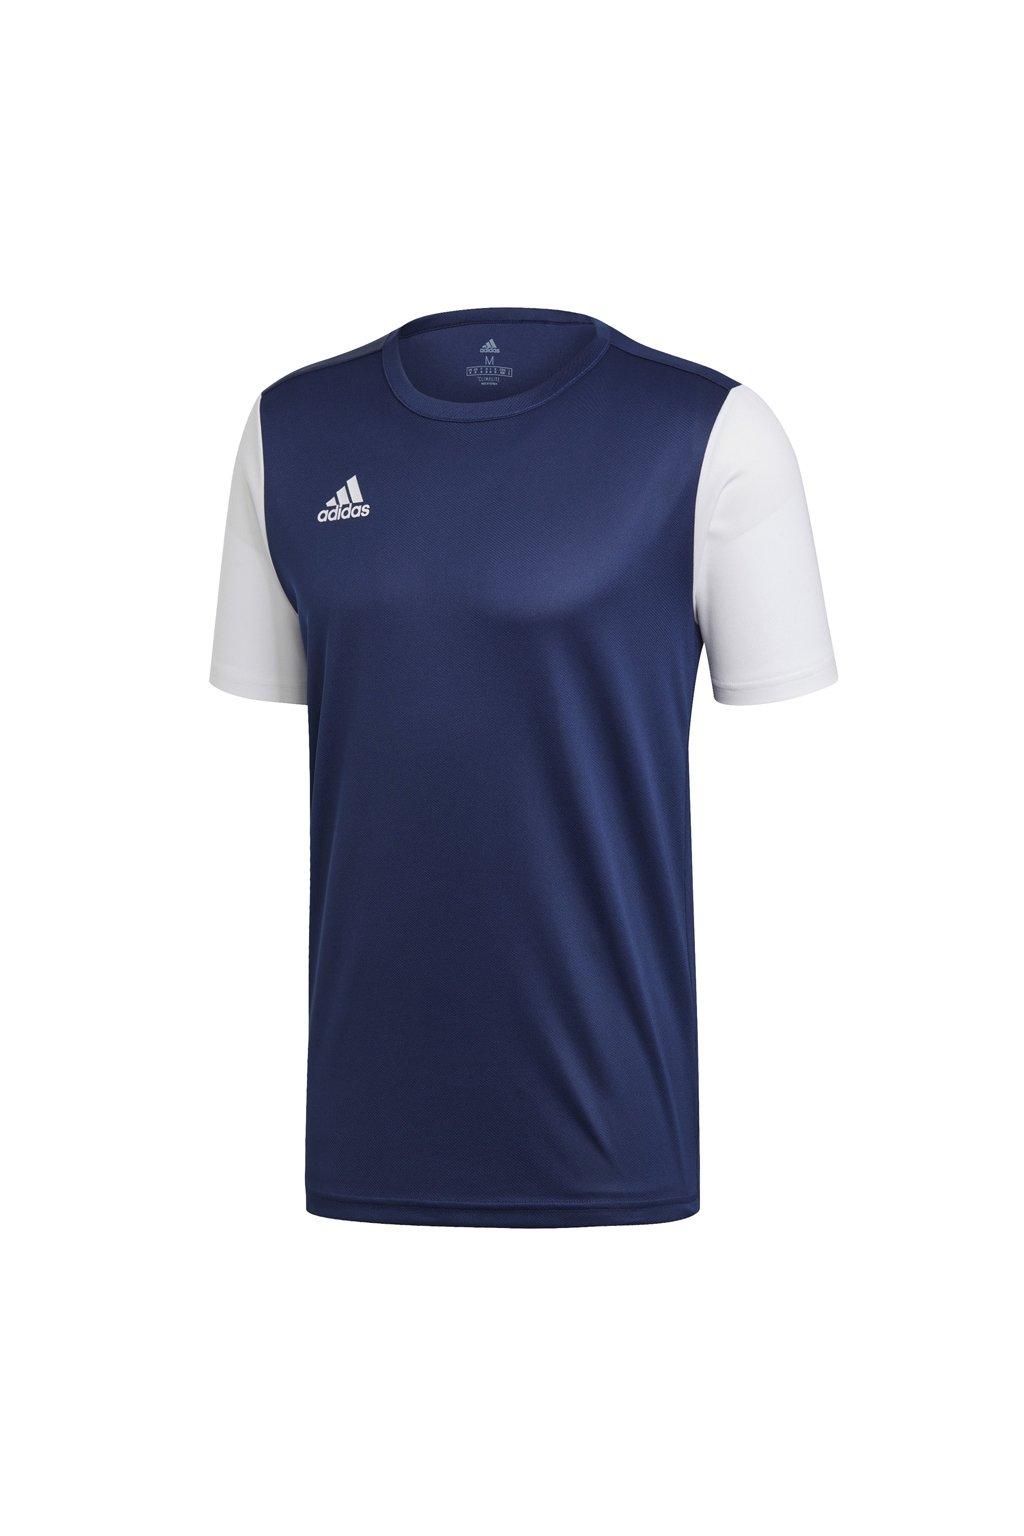 Detské tričko Adidas Estro 19 Jersey JUNIOR námornícka modrá DP3232